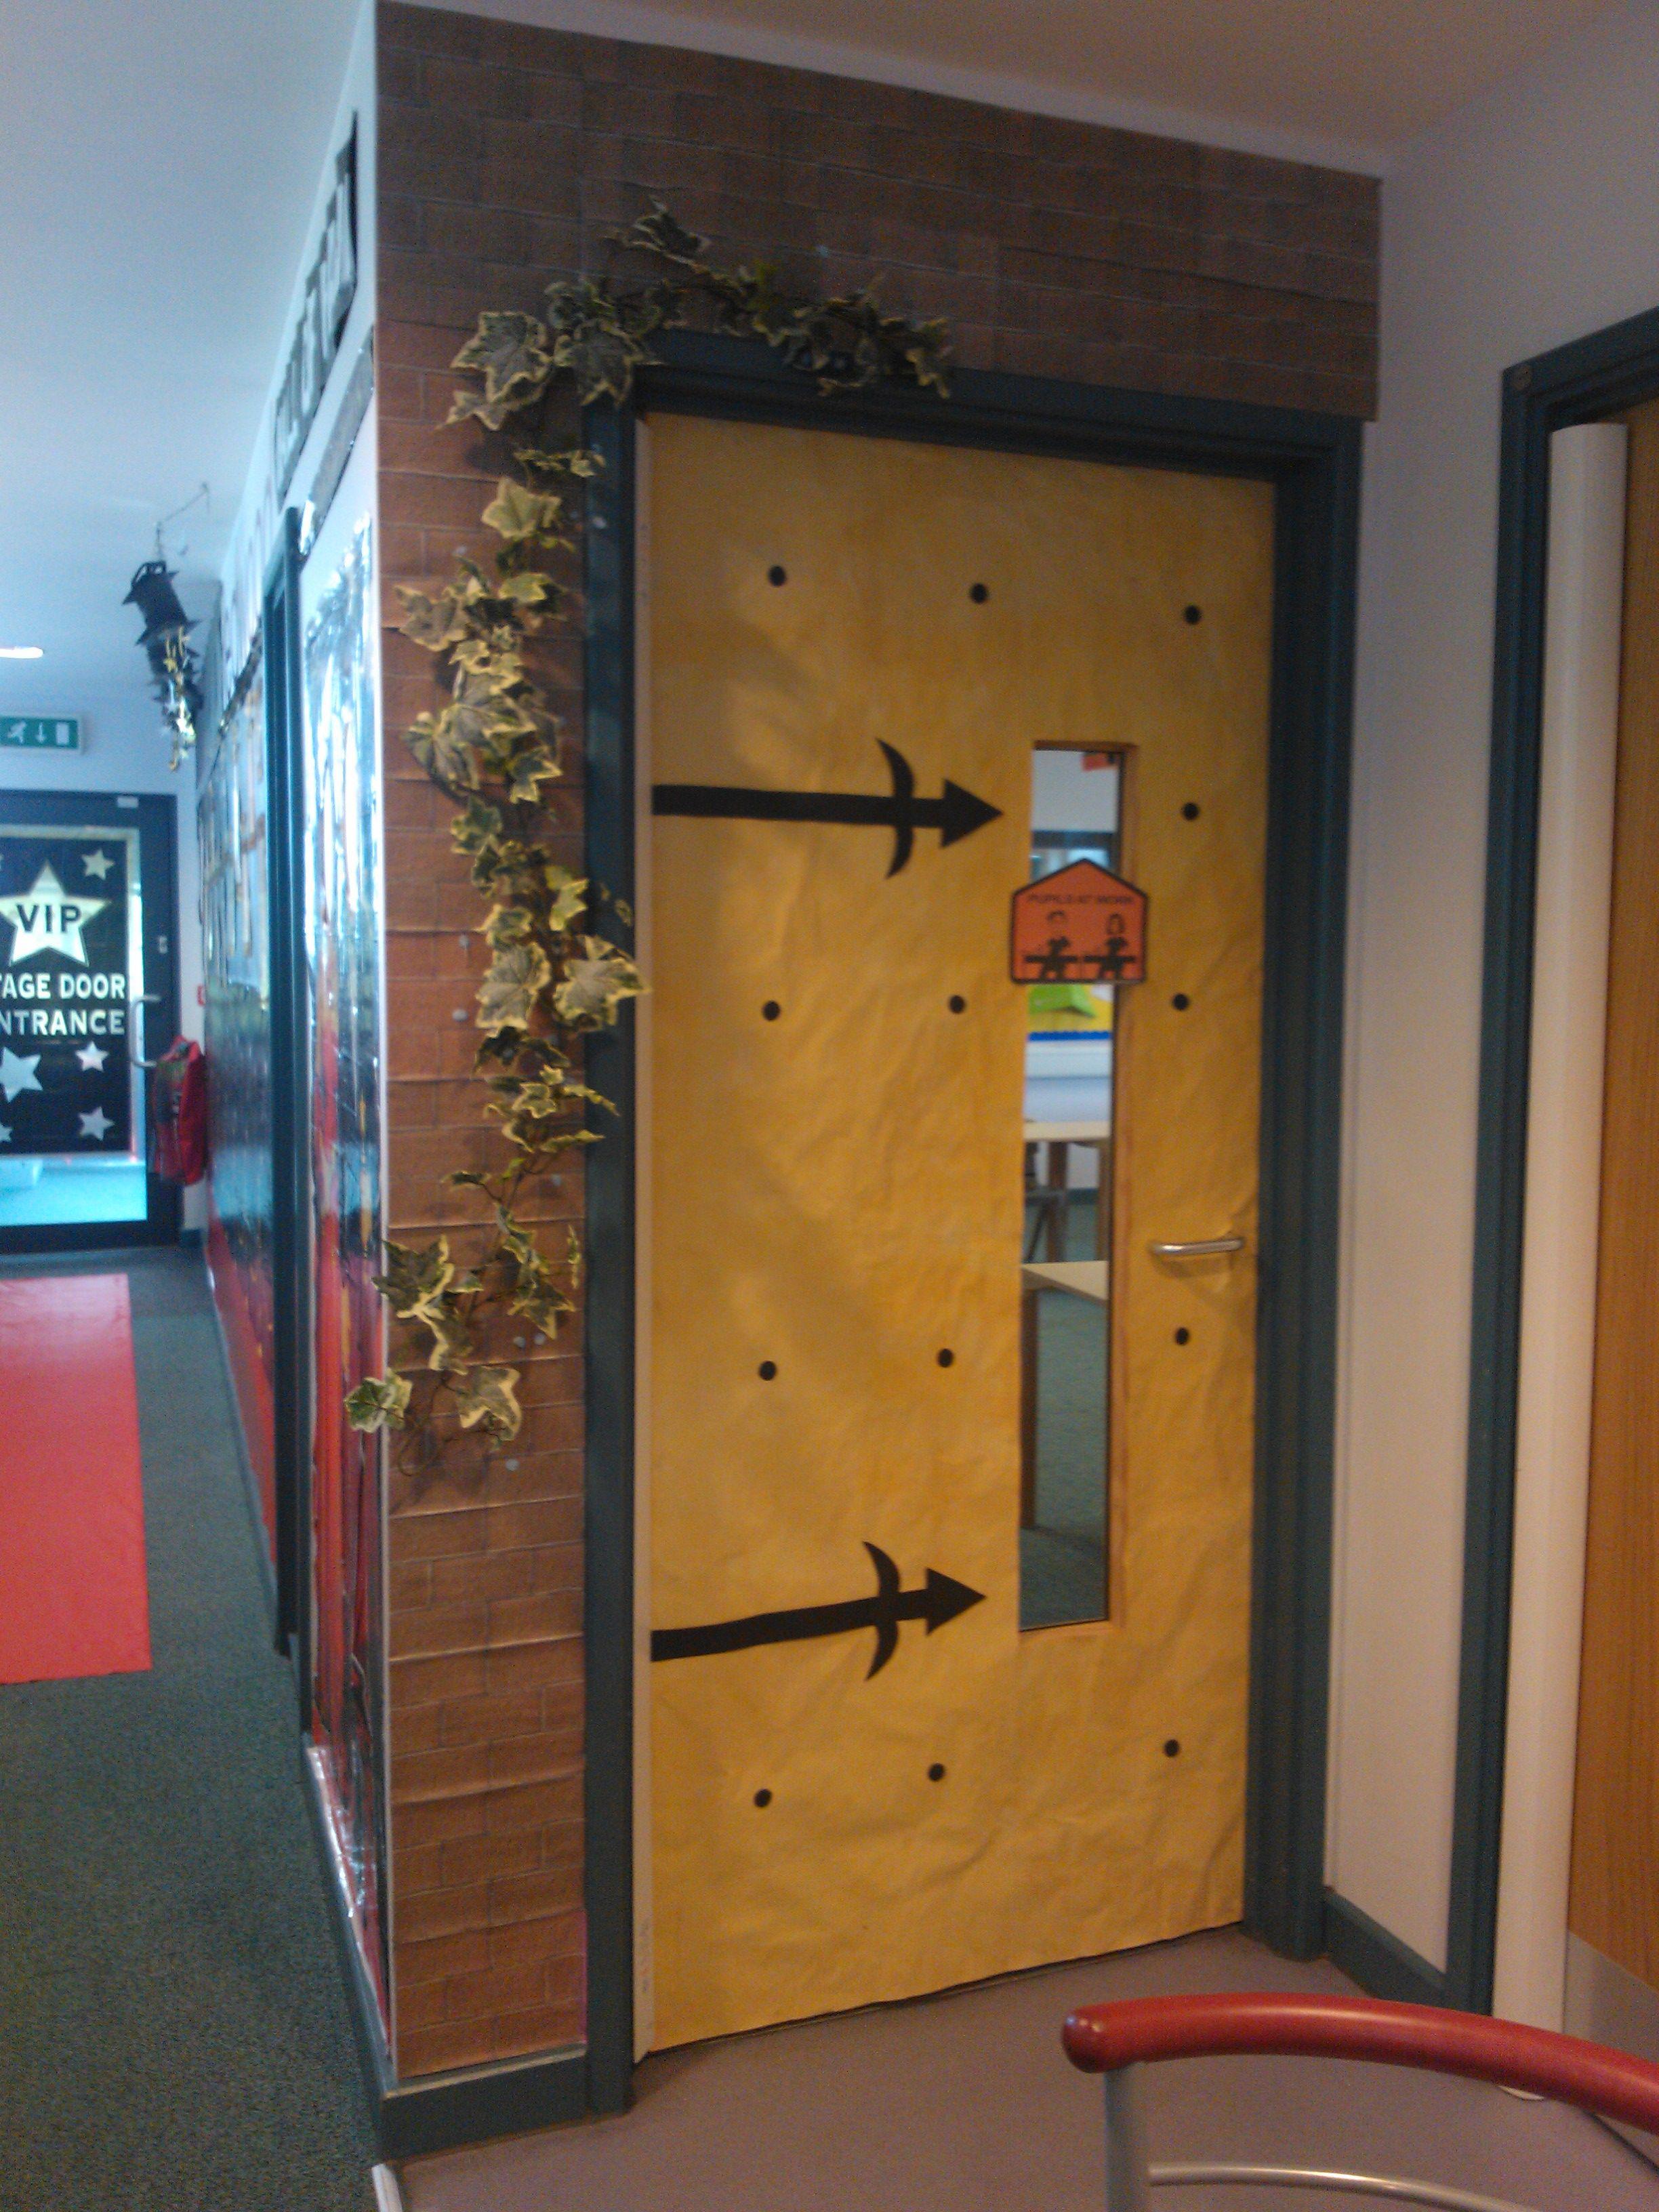 castle entrance/ classroom door ff4e7fa8f1c3394803957771f6ad74f0